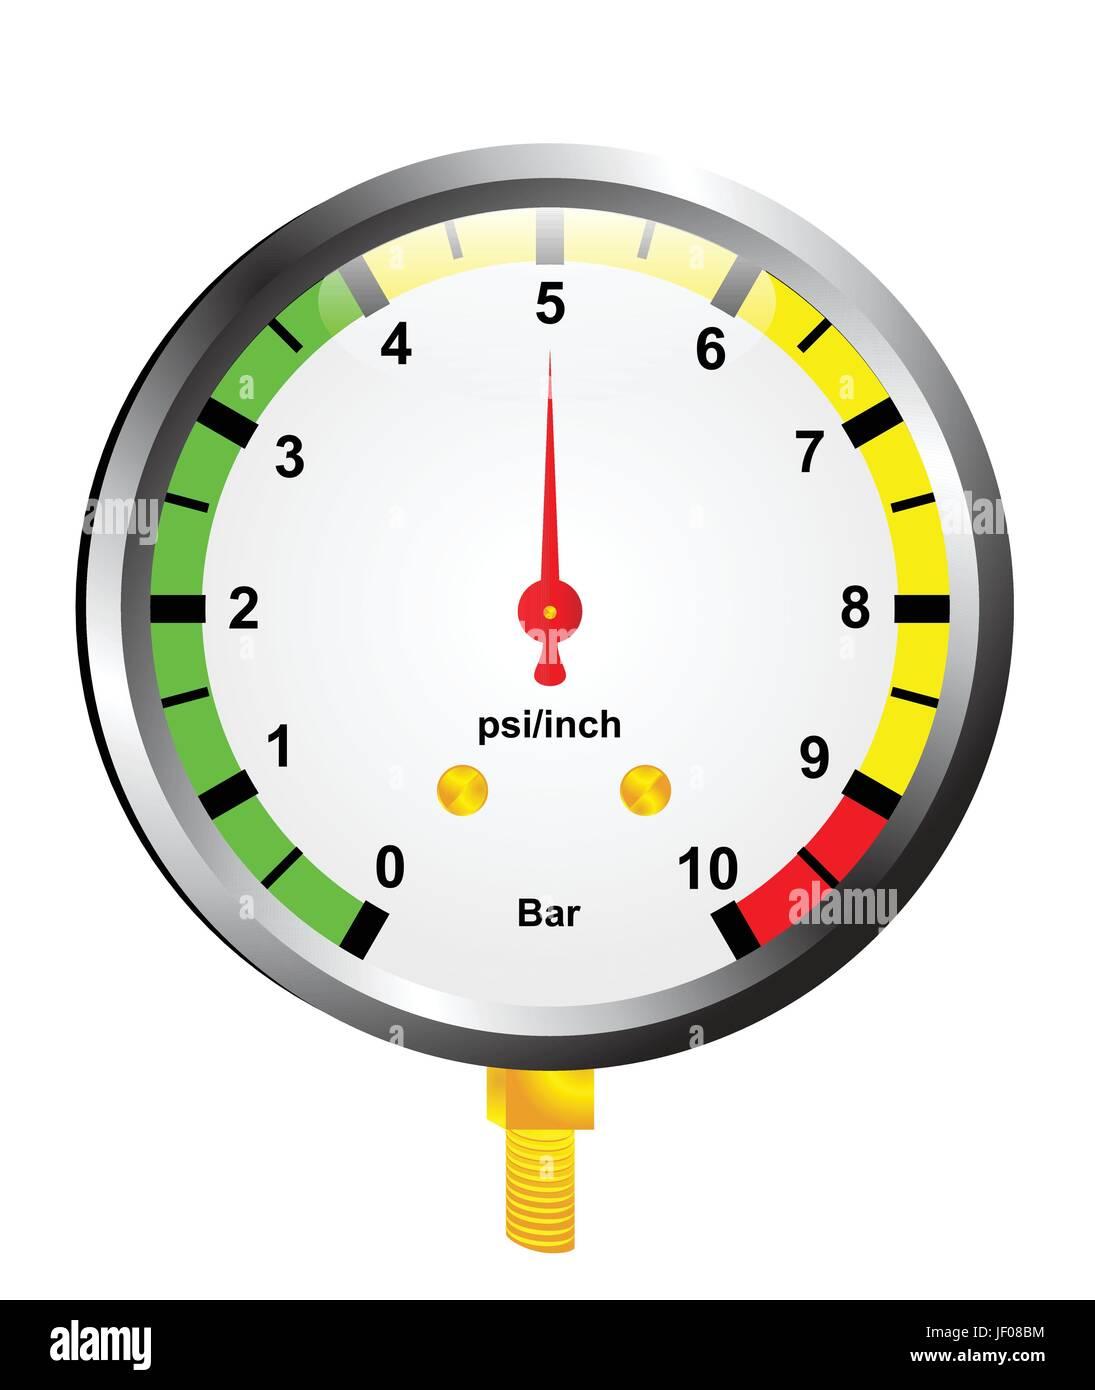 heat, dial, measurement, indicator, air, gage, measure, instrument, method, - Stock Vector